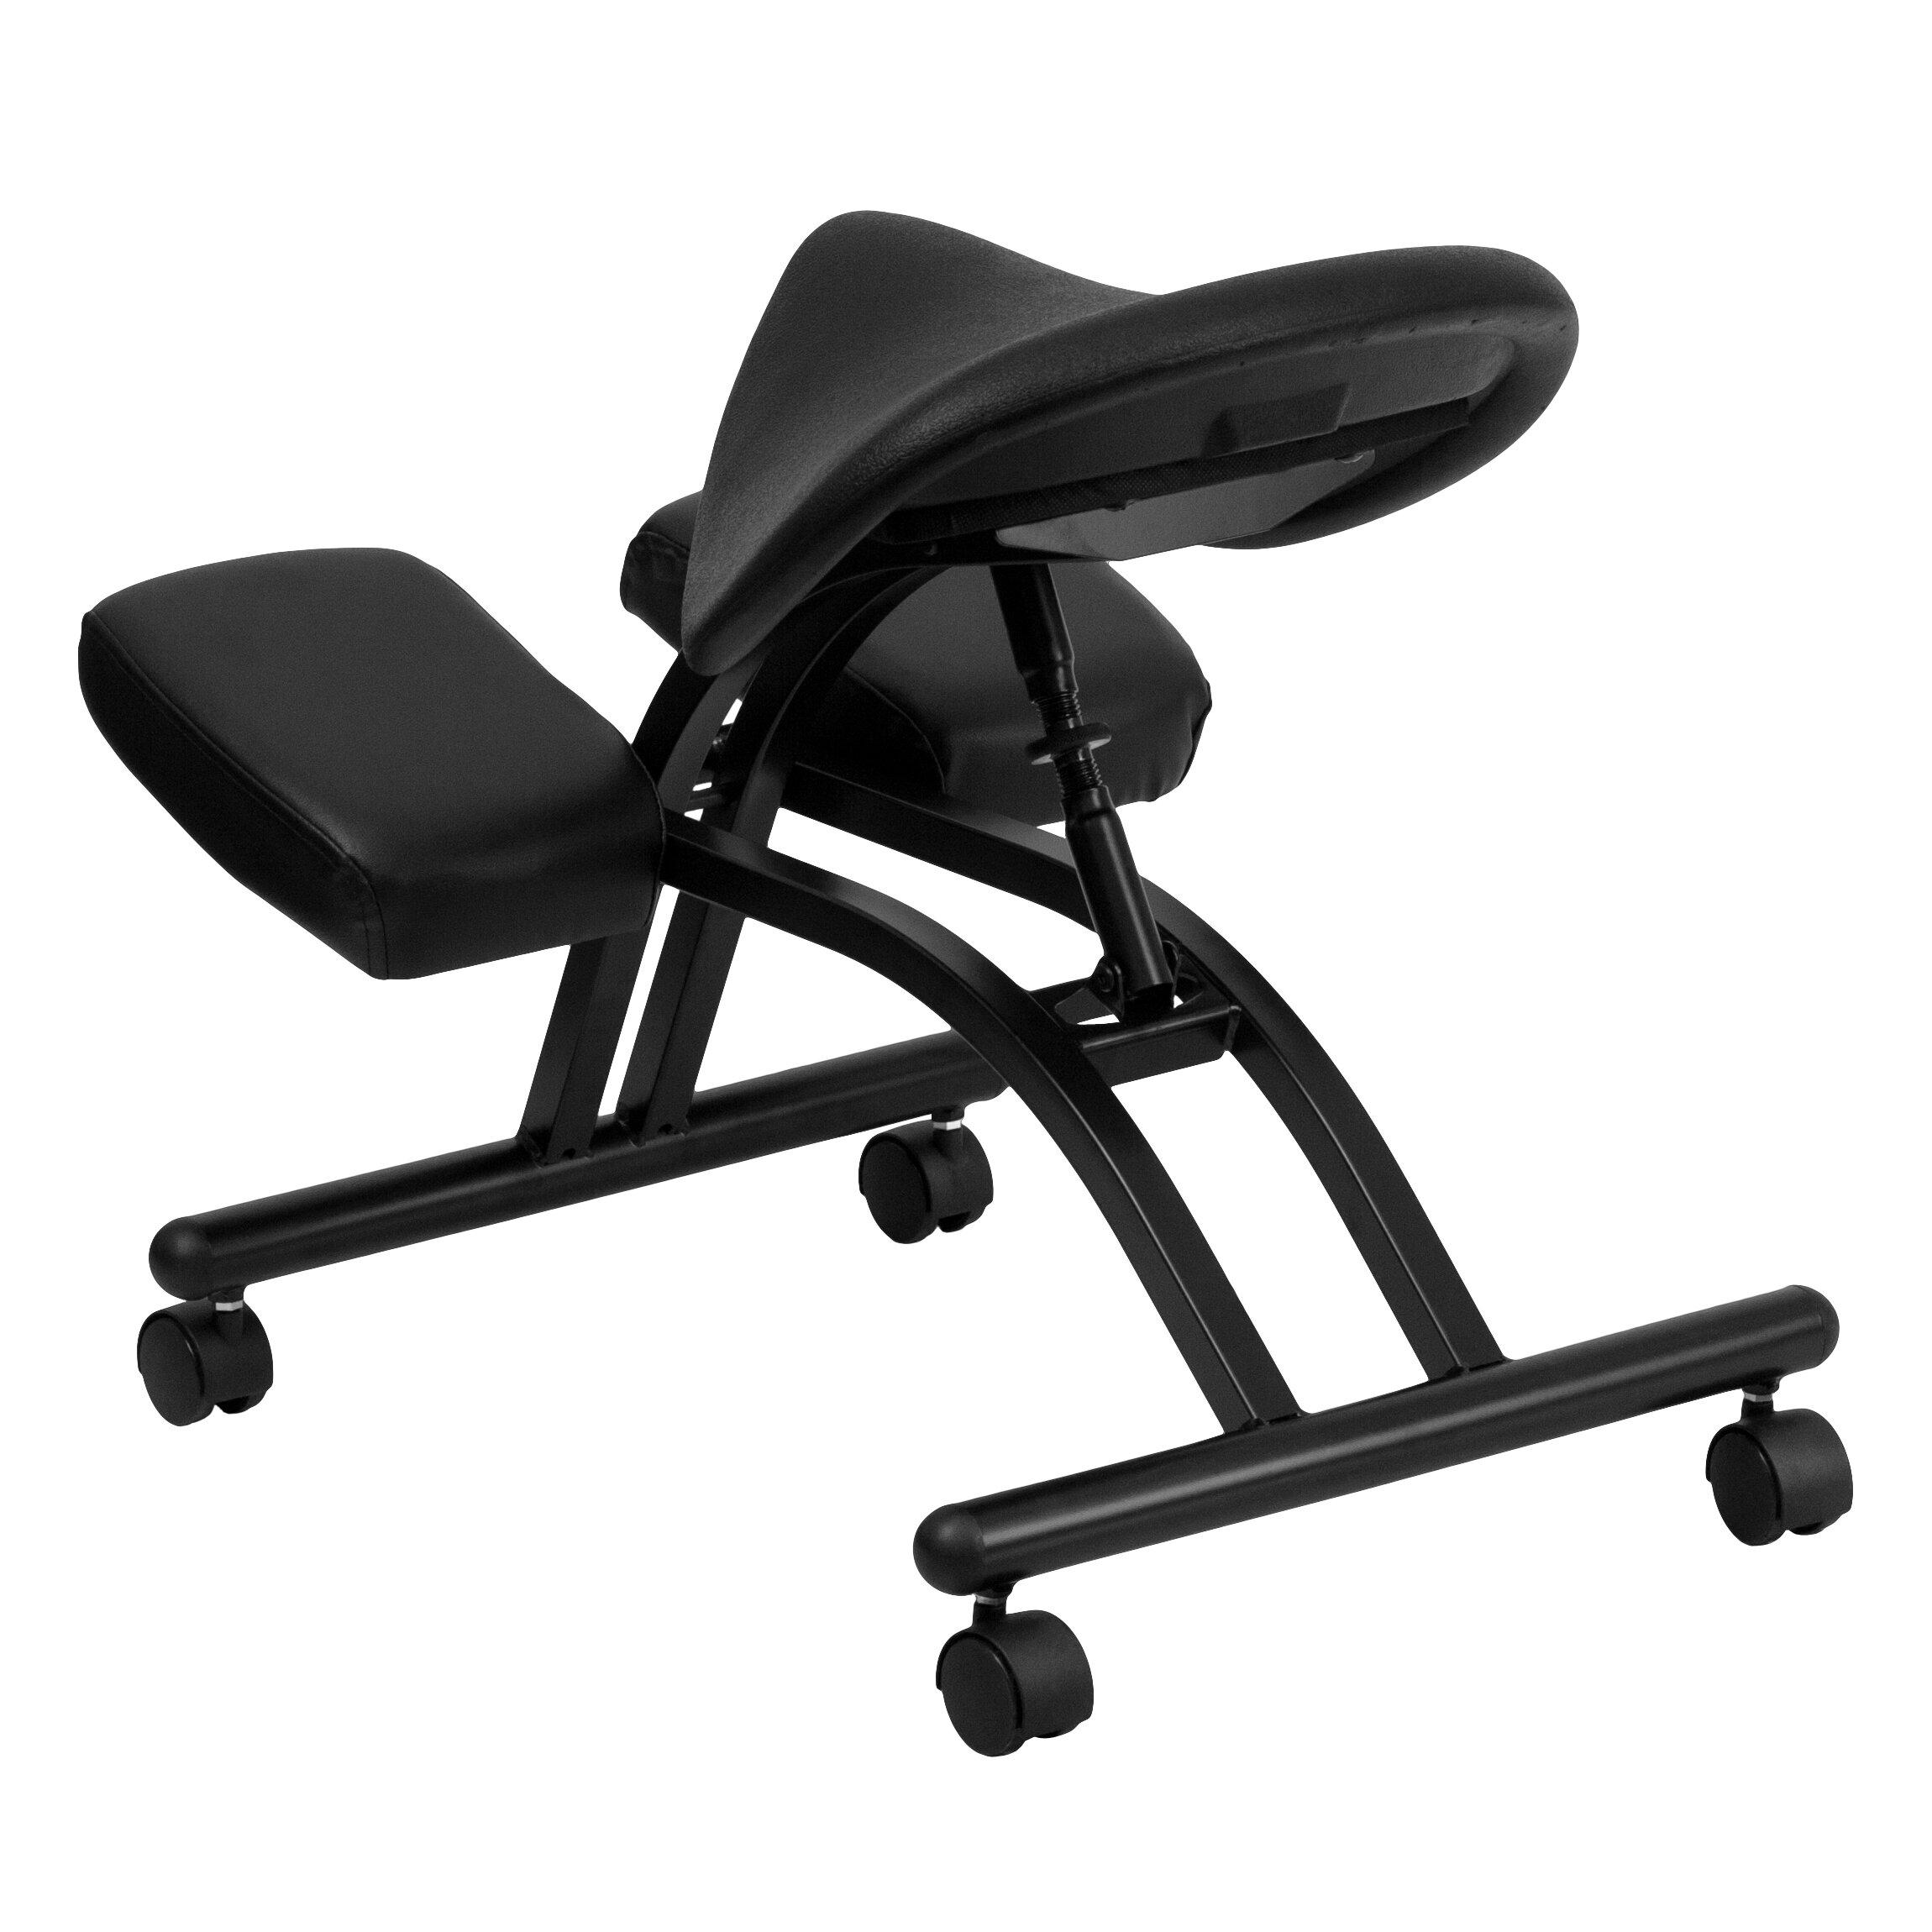 Flash Furniture Ergonomic Kneeling Chair with Saddle Seat